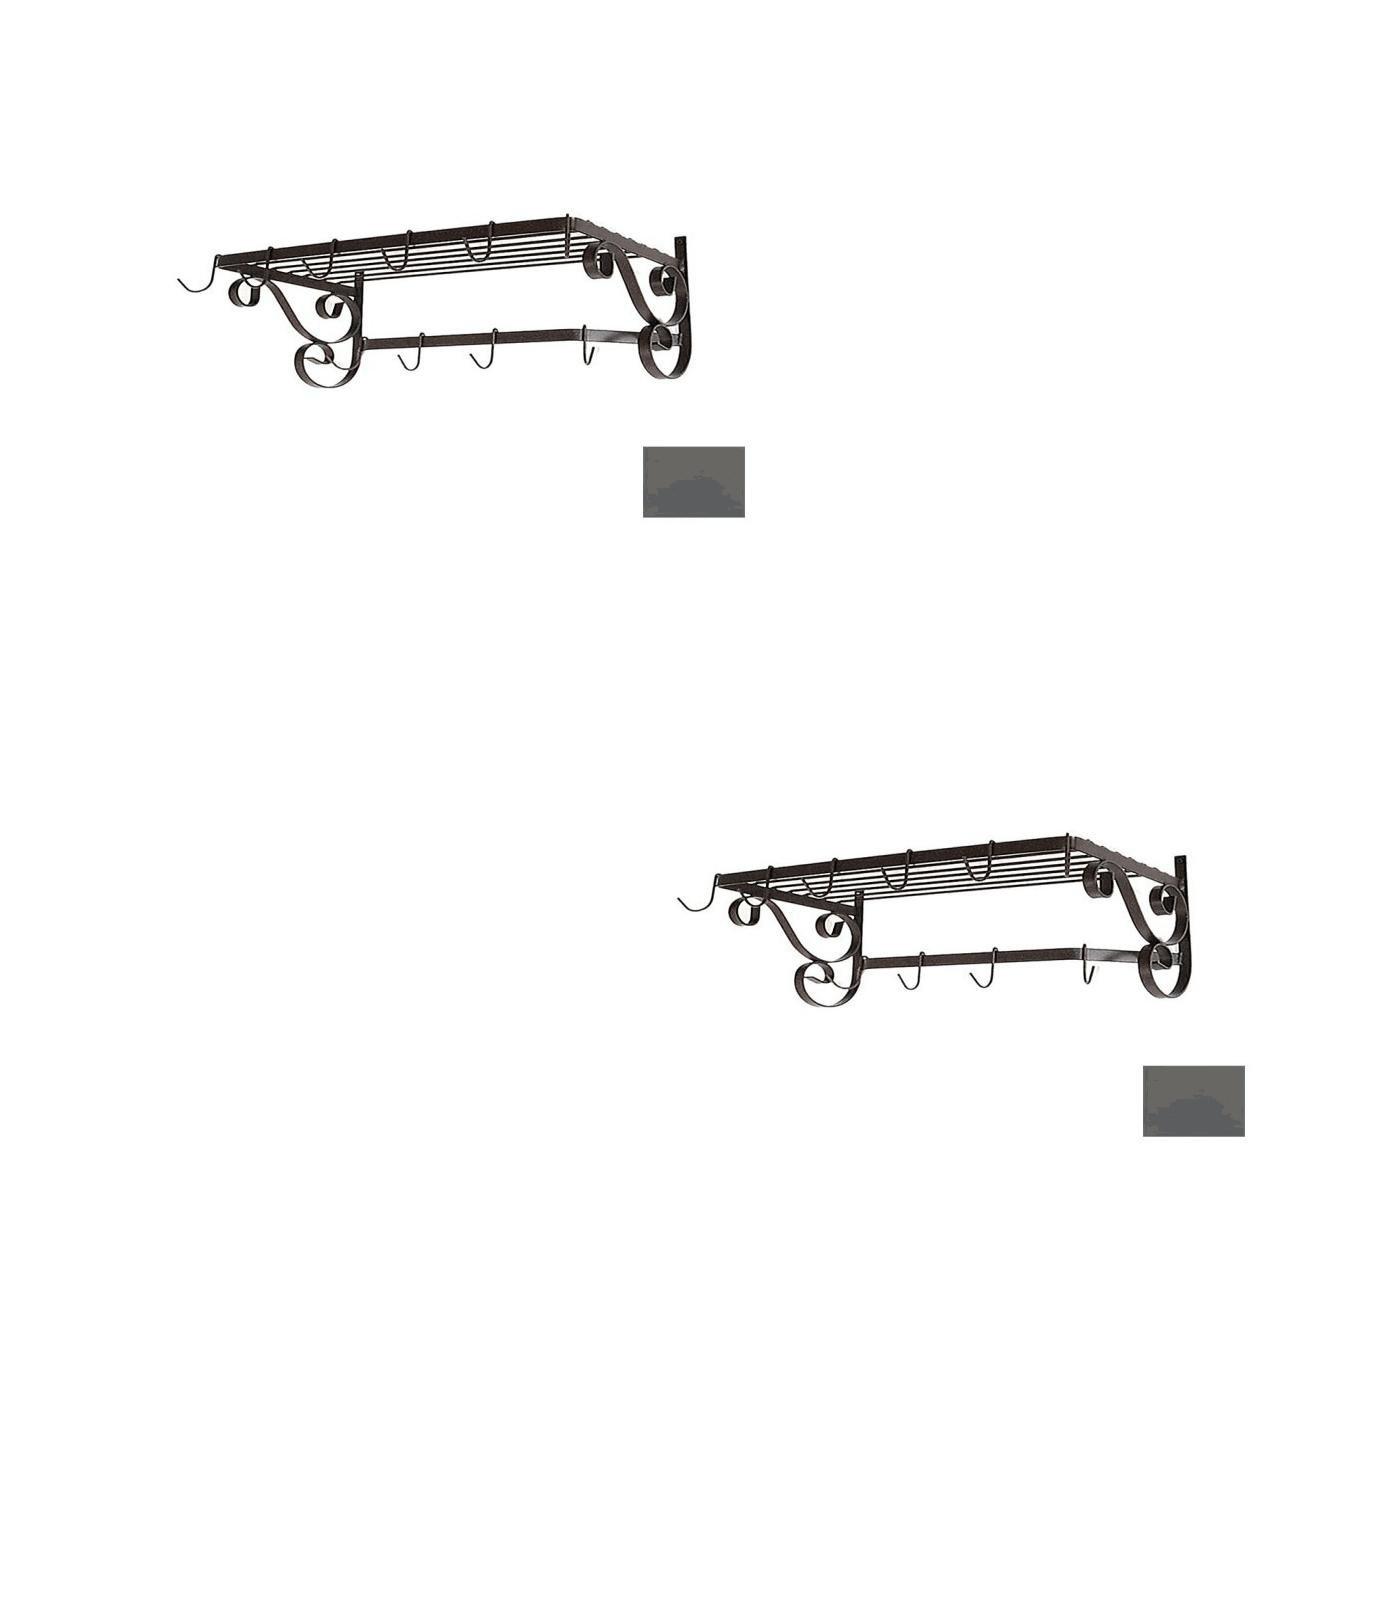 24-1/2-in x 13-in Jade Teal Rectangle Pot Rack - Grace Collection Model - GMC-WR24-UB-JT - Set of 2 Gift Bundle